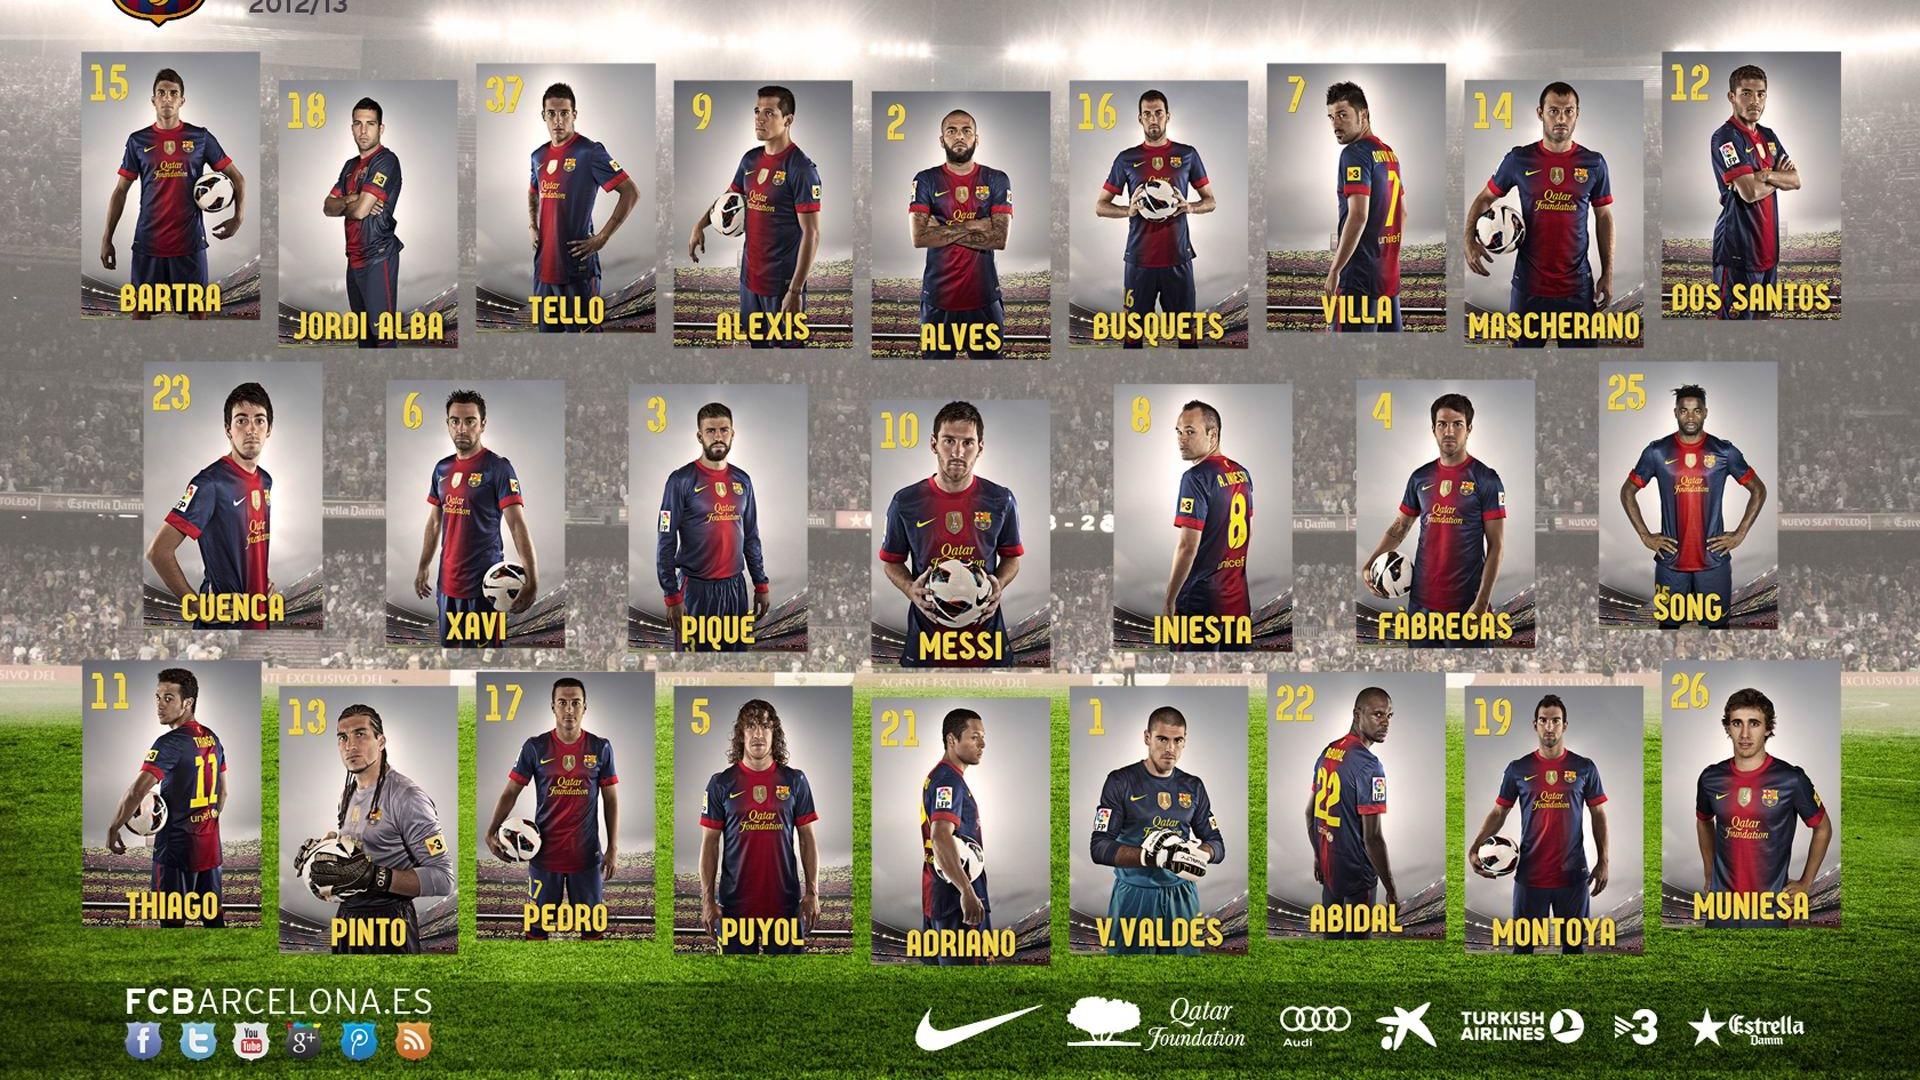 Joueurs 2012 13 Fc Barcelone Club Hd Fond Décran Aperçu